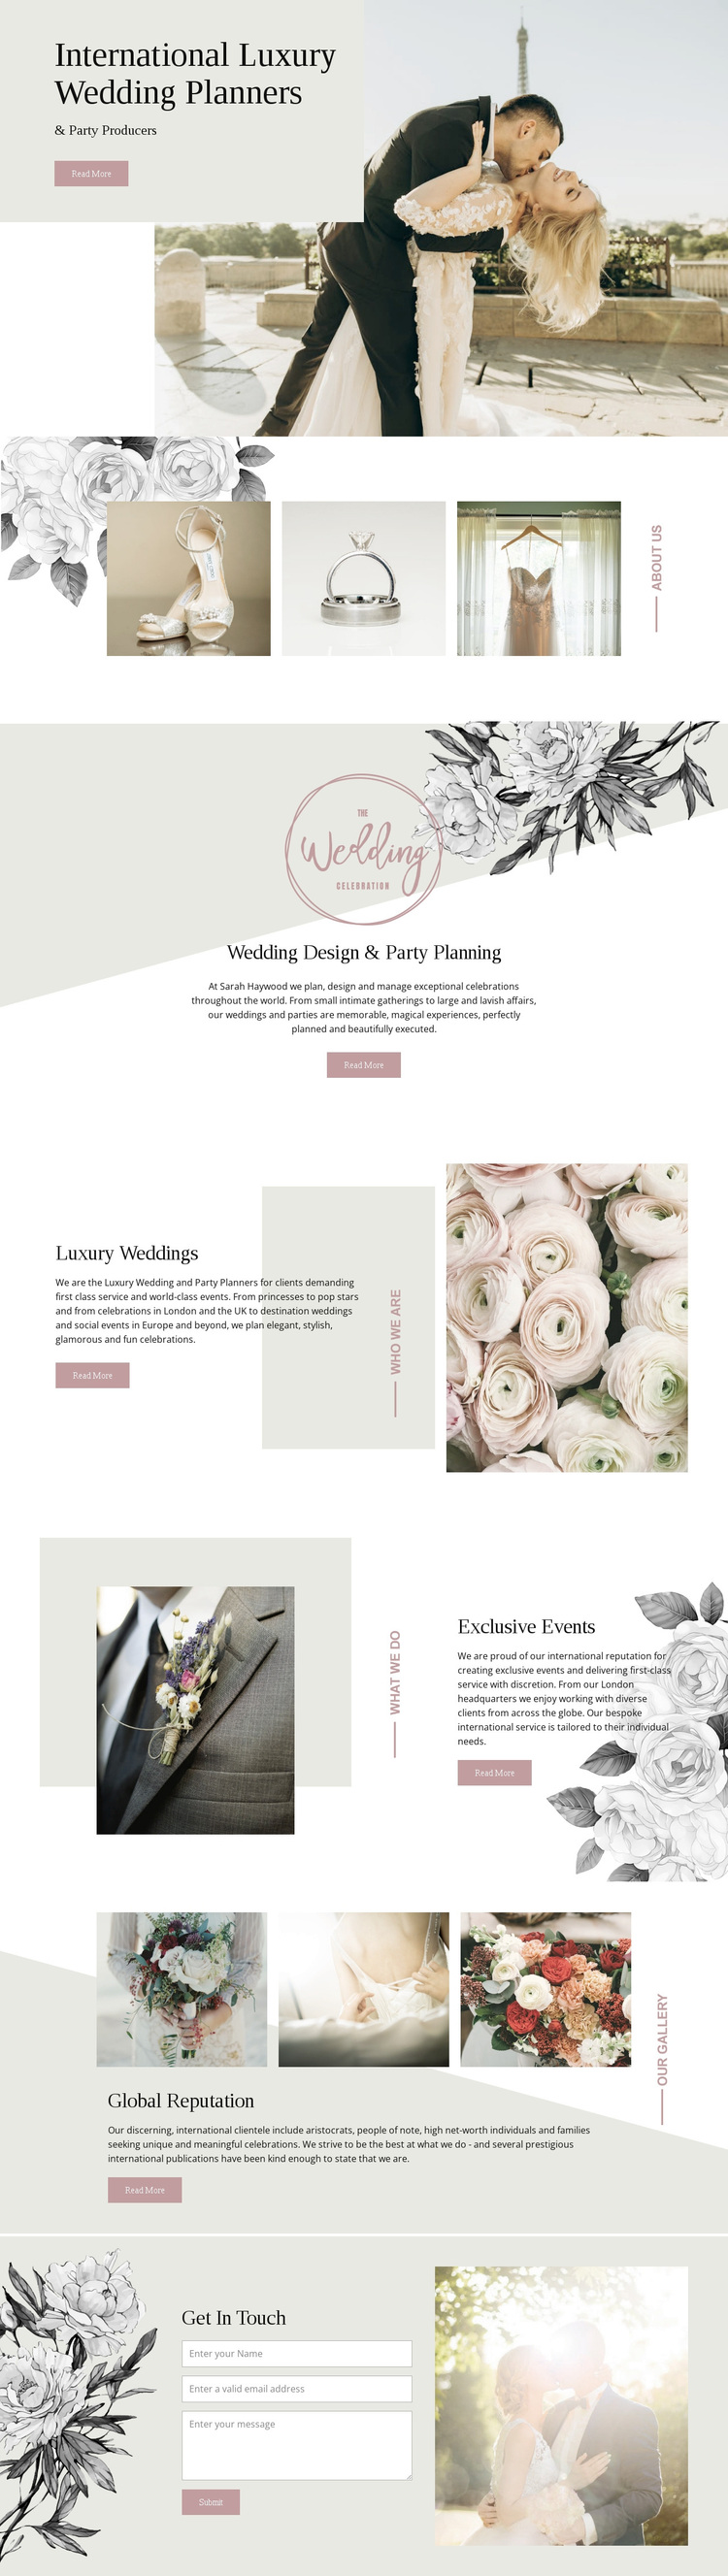 Planners of luxury wedding Joomla Page Builder